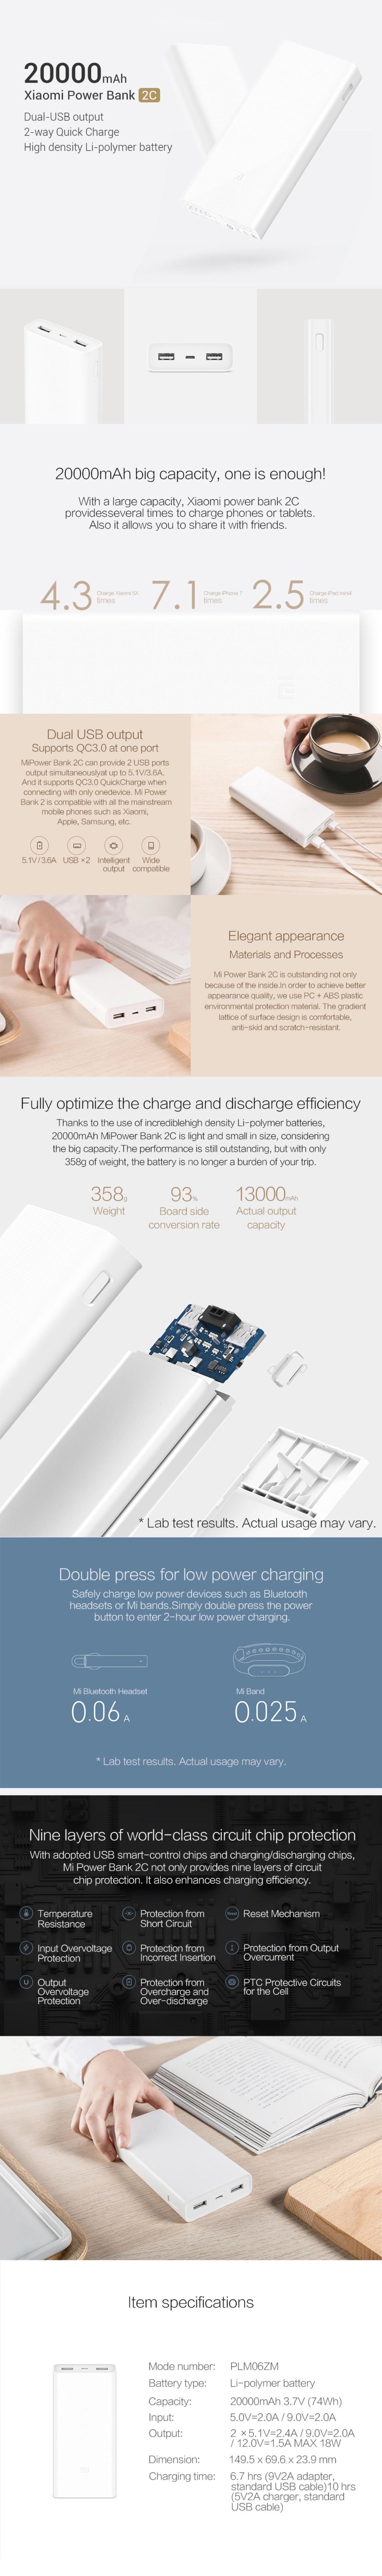 Prezentare-Xiaomi-Mi-Power-Bank-2C6934d3e1536c880b.jpg